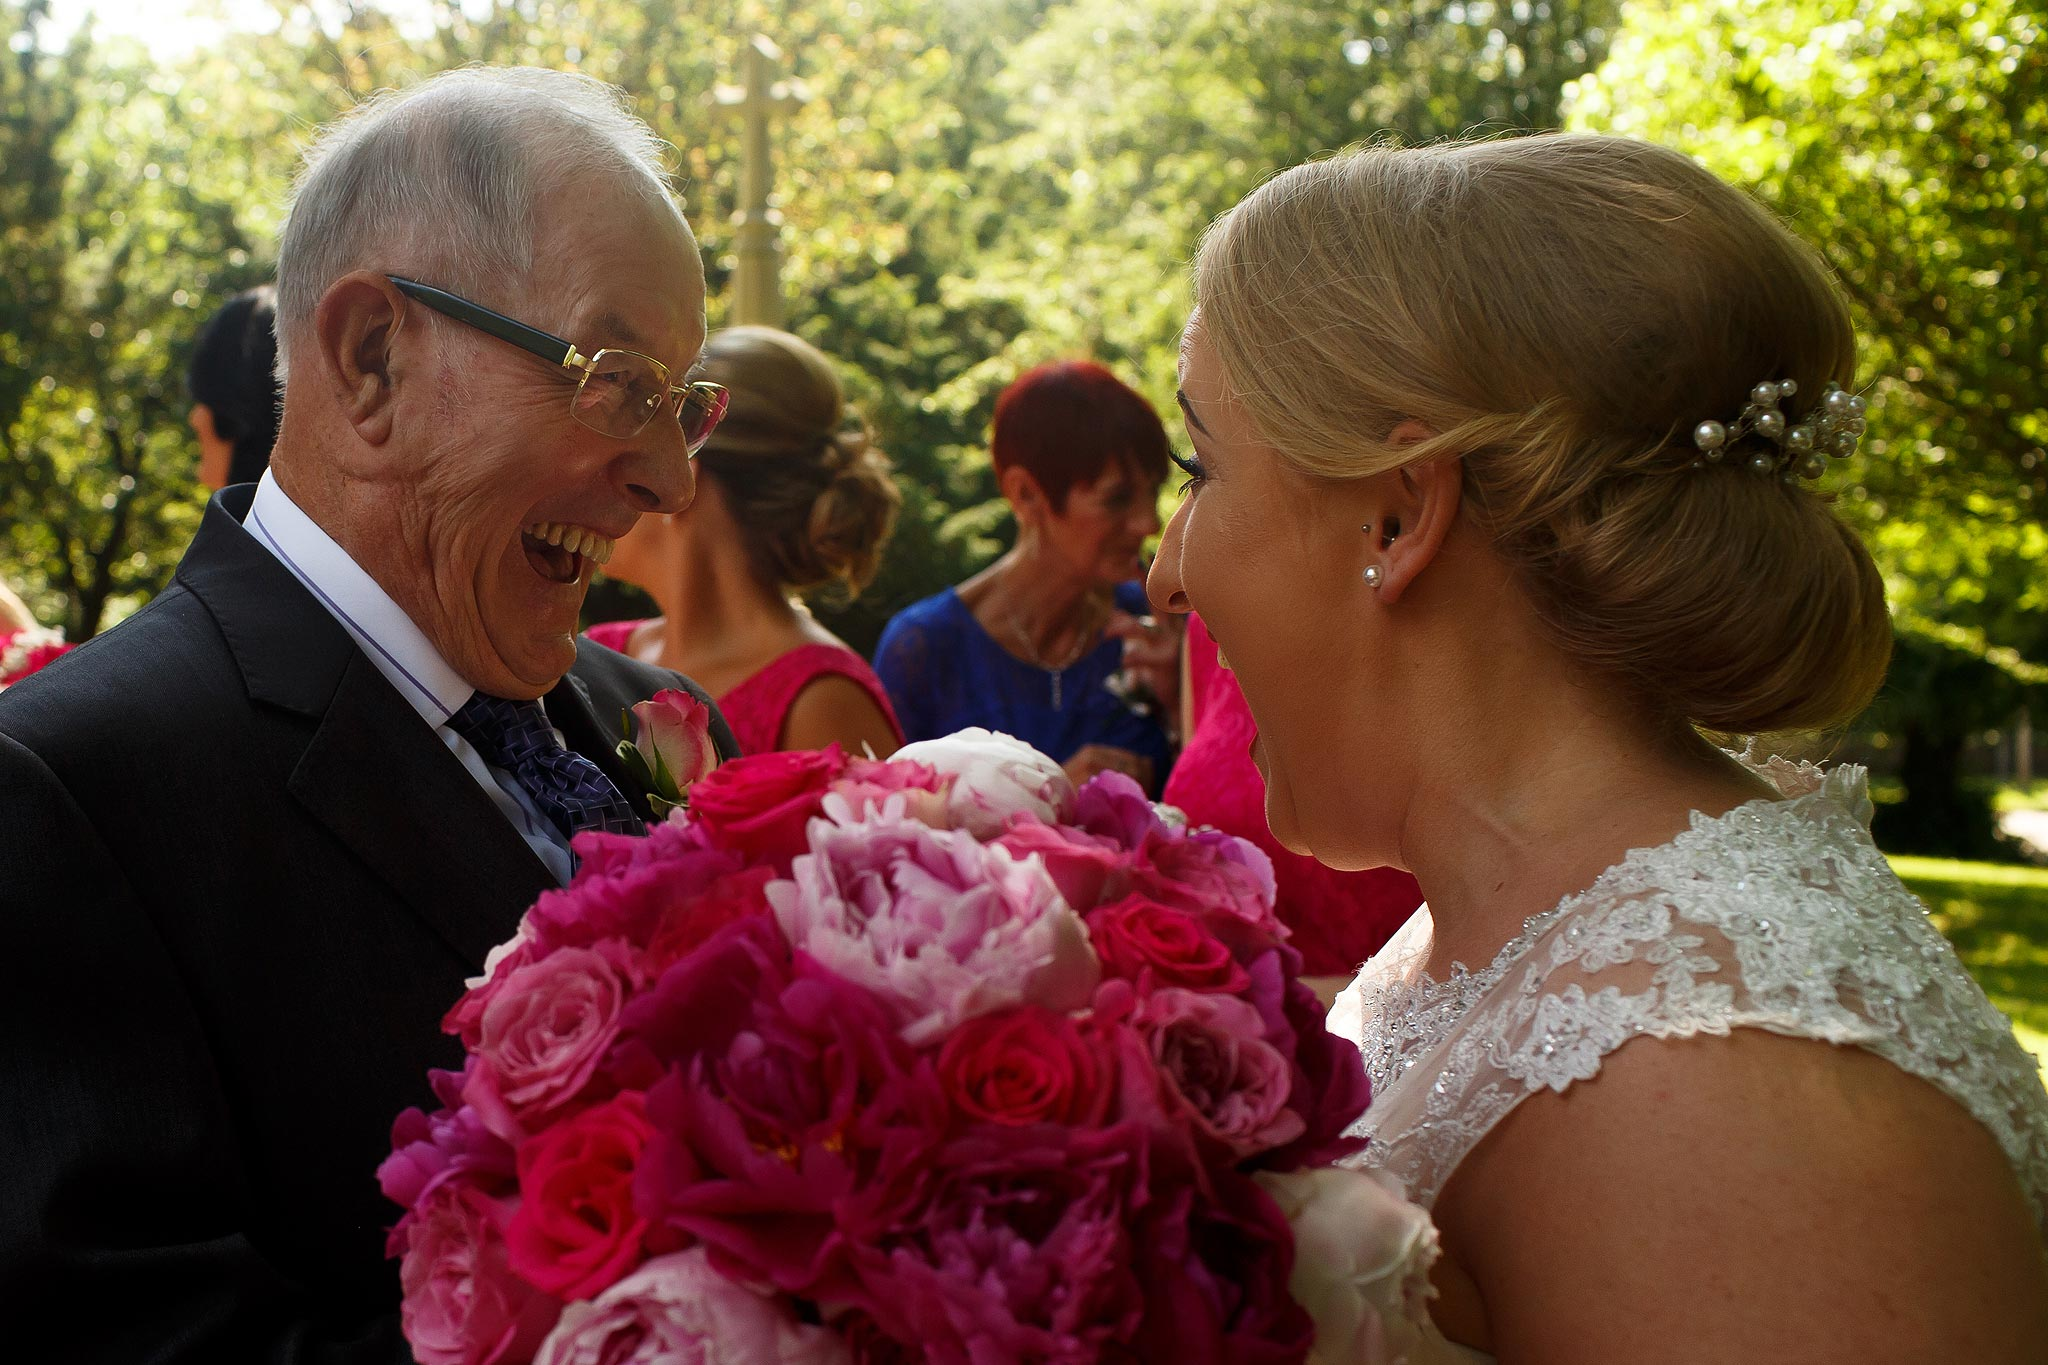 Guest congratulating newlywed bride outside church